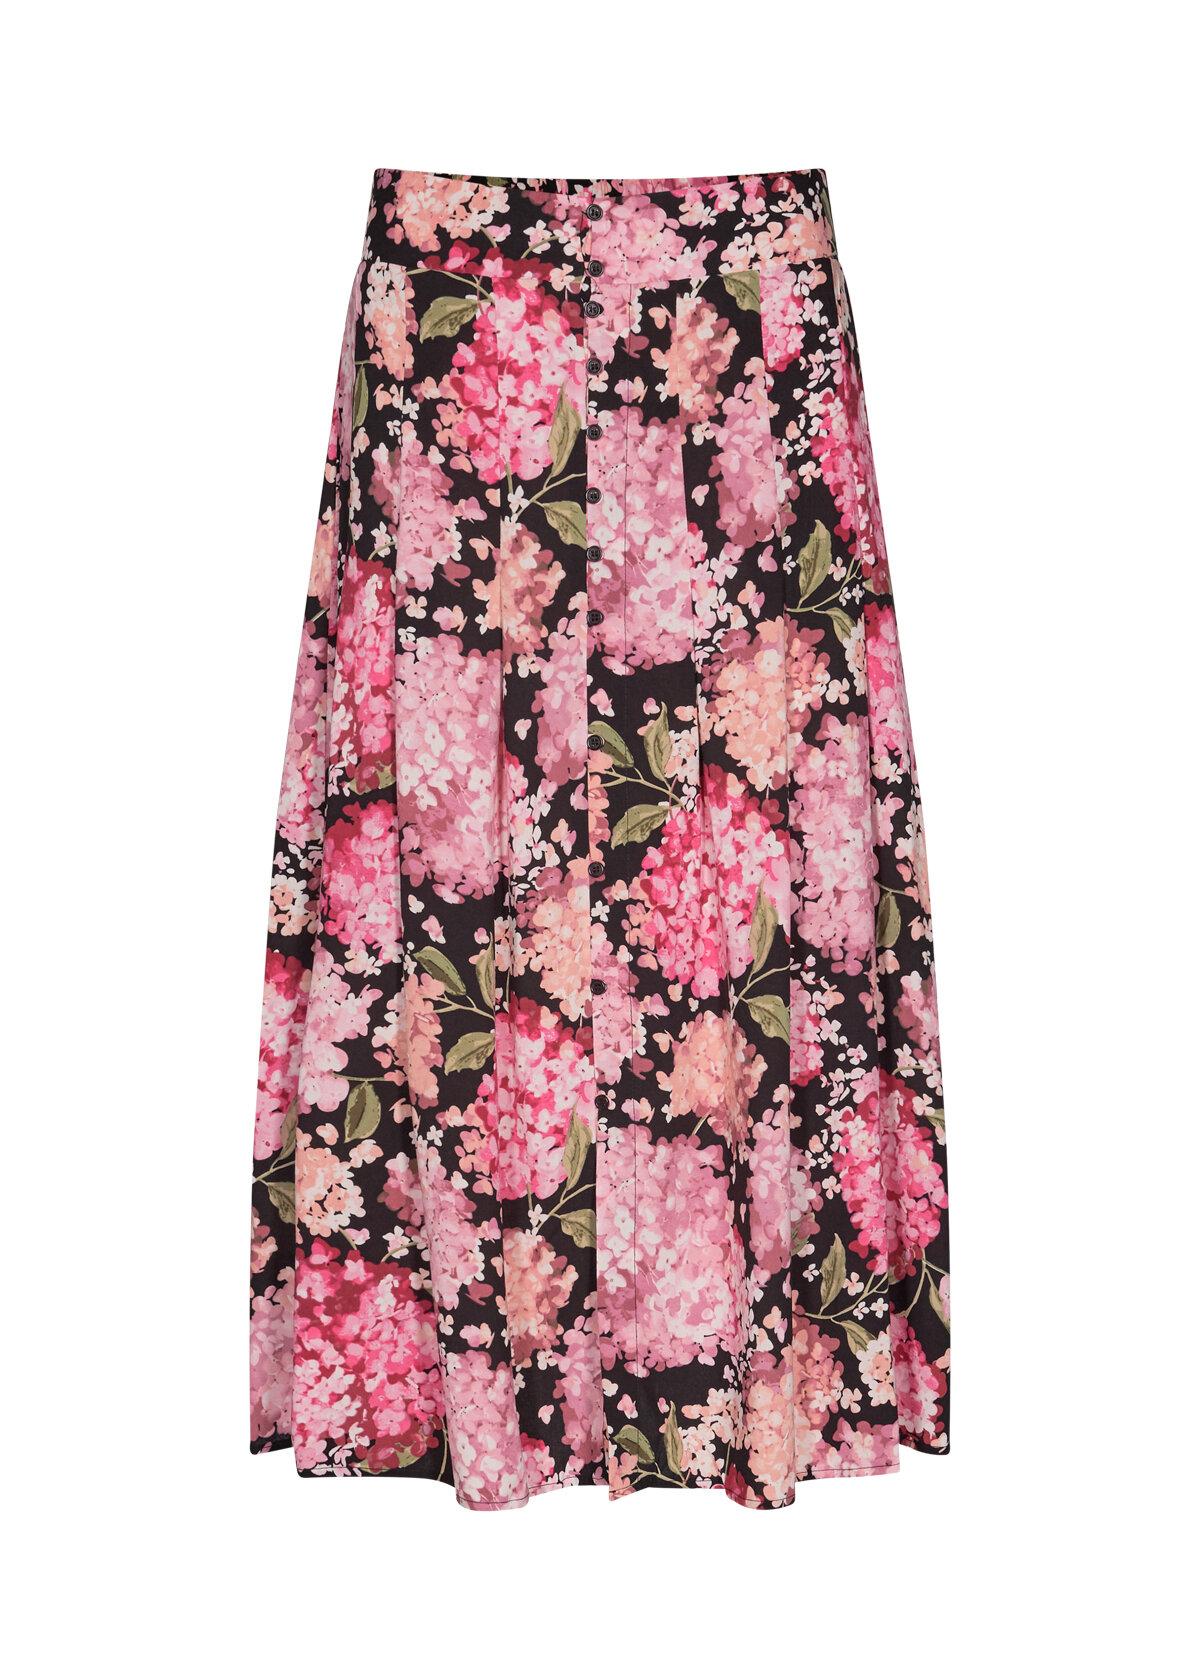 Paris Blommig Viskoskjol - Pink Combi